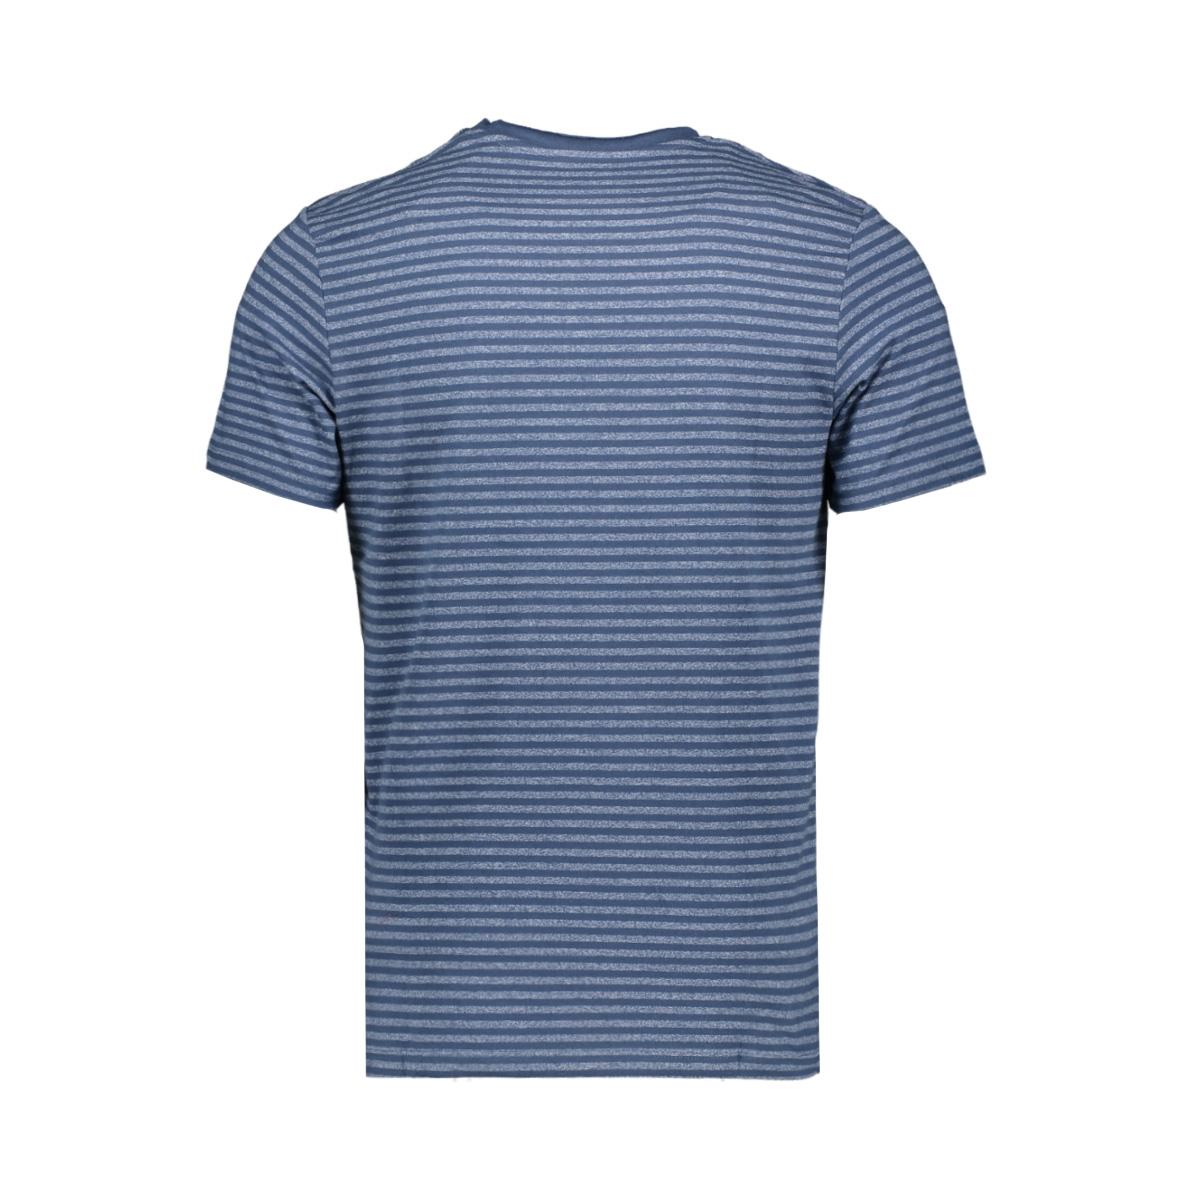 jormargo tee ss v neck 12160835 jack & jones t-shirt dark denim/slim